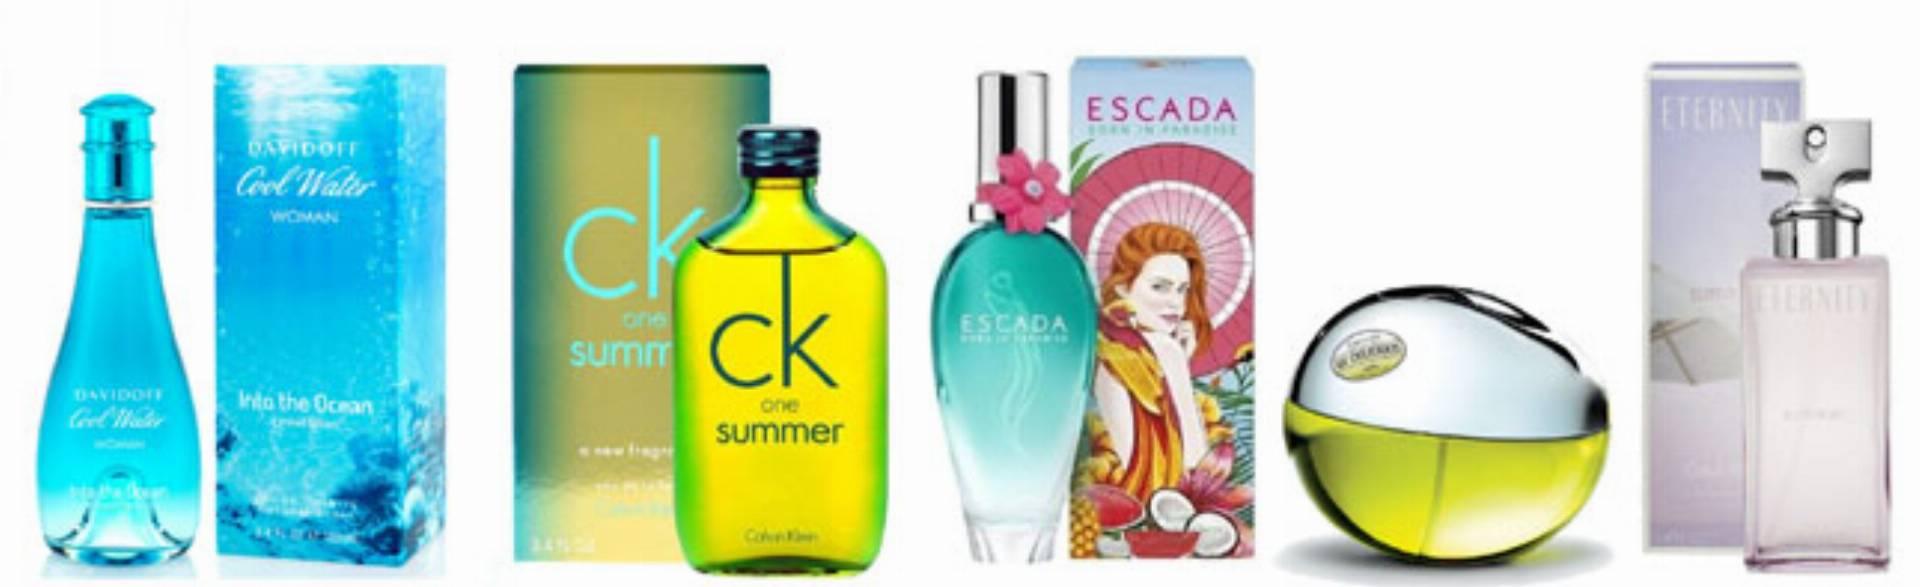 Top 5 perfum